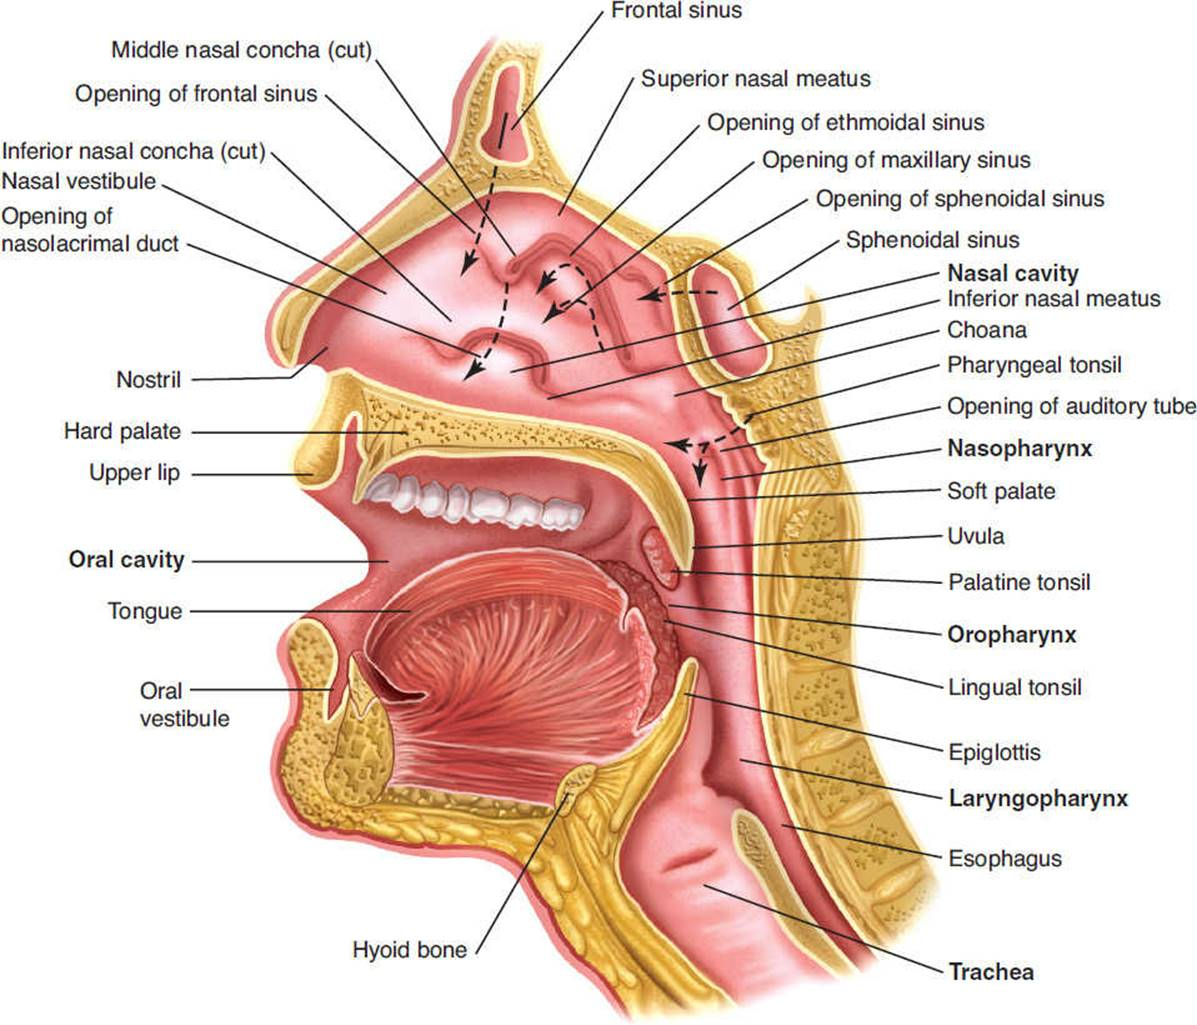 Anatomy of the Cardiopulmonary System - Cardiovascular and Pulmonary ...